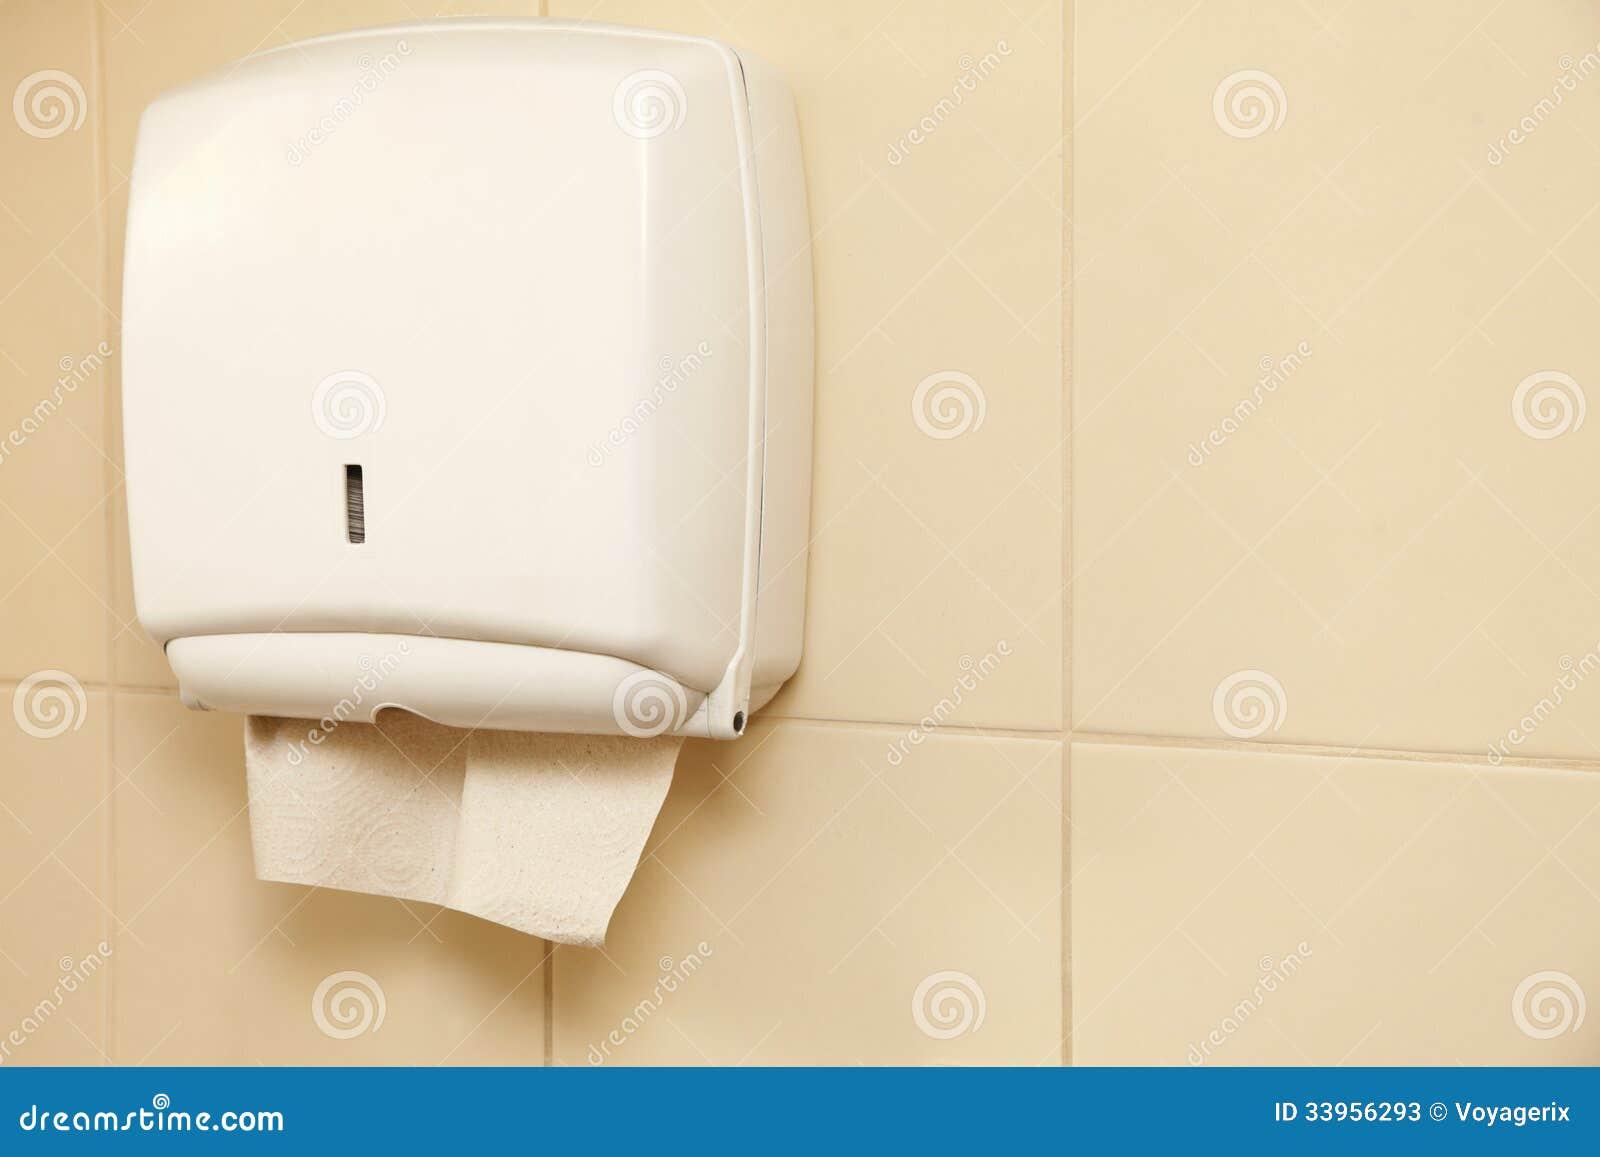 Paper Towel Dispenser Bathroom Bathroom Paper Towel Dispenser Home Depot Home Design Ideas